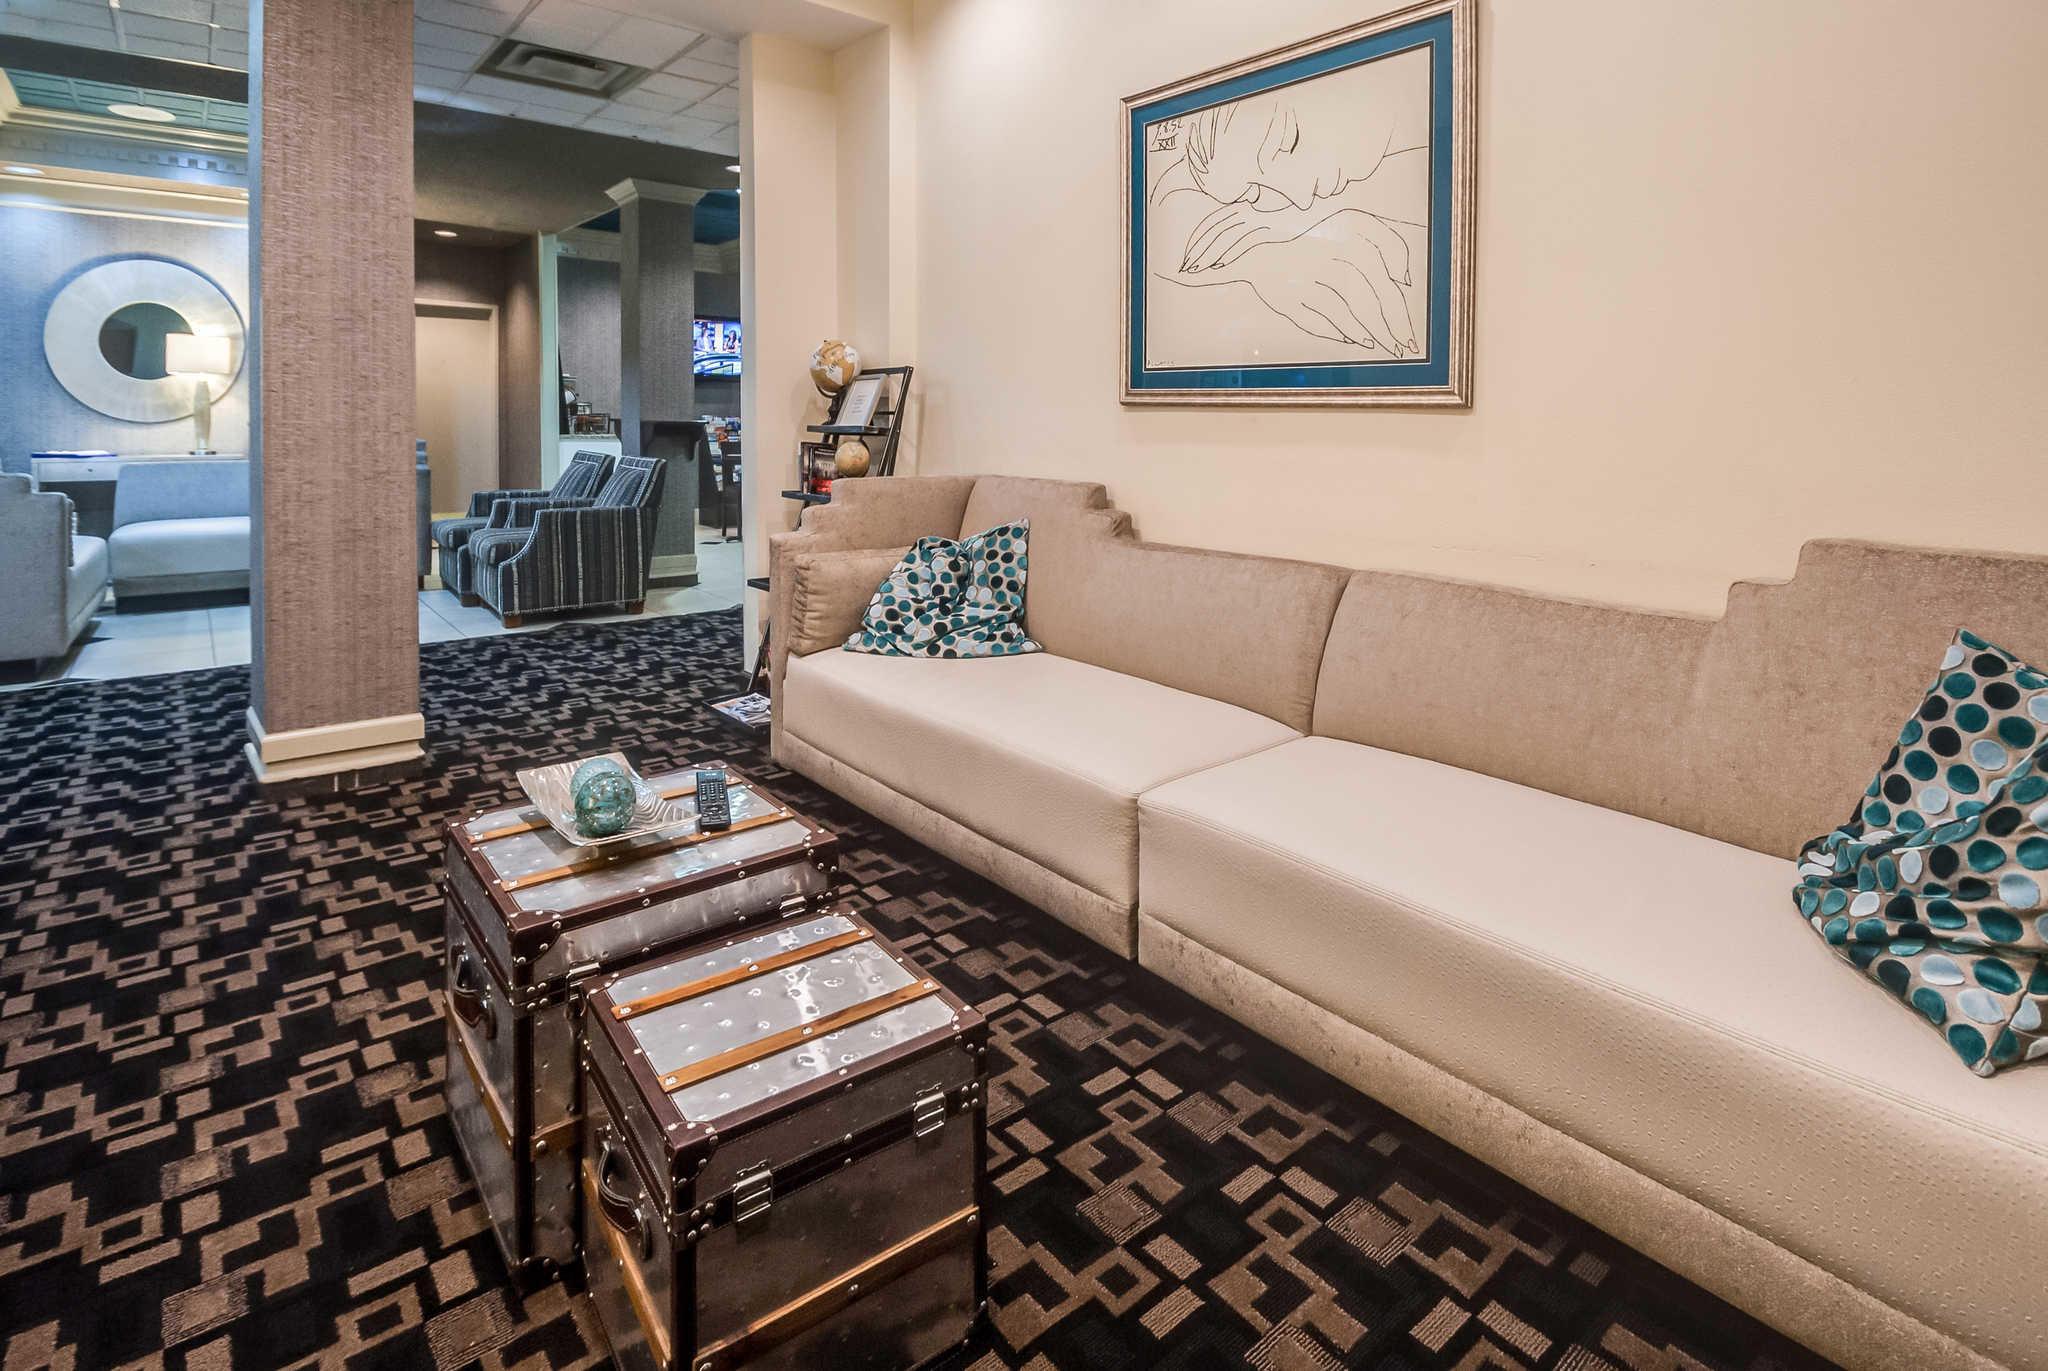 Hotels In Overland Park Ks Overland Park Marriott Autos Post